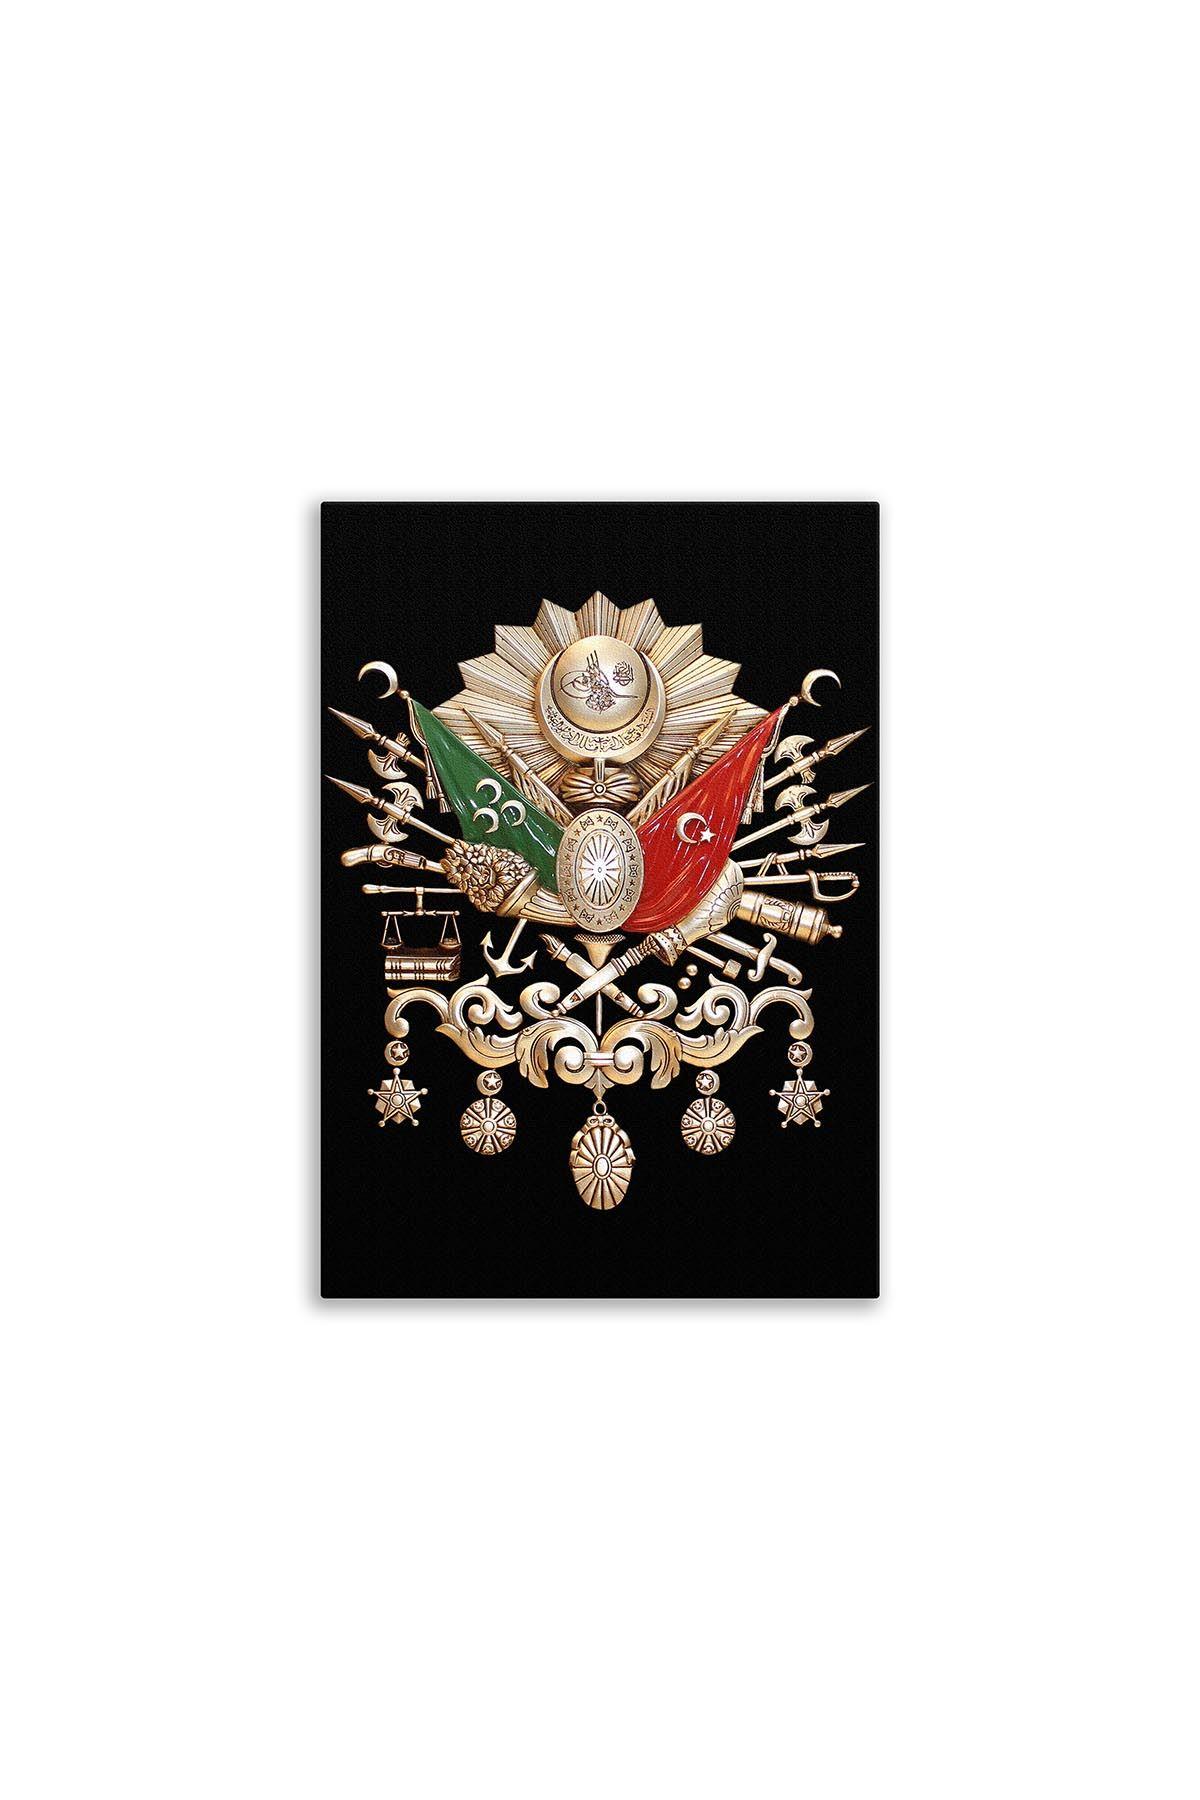 Ottoman State Emblem Canvas Board